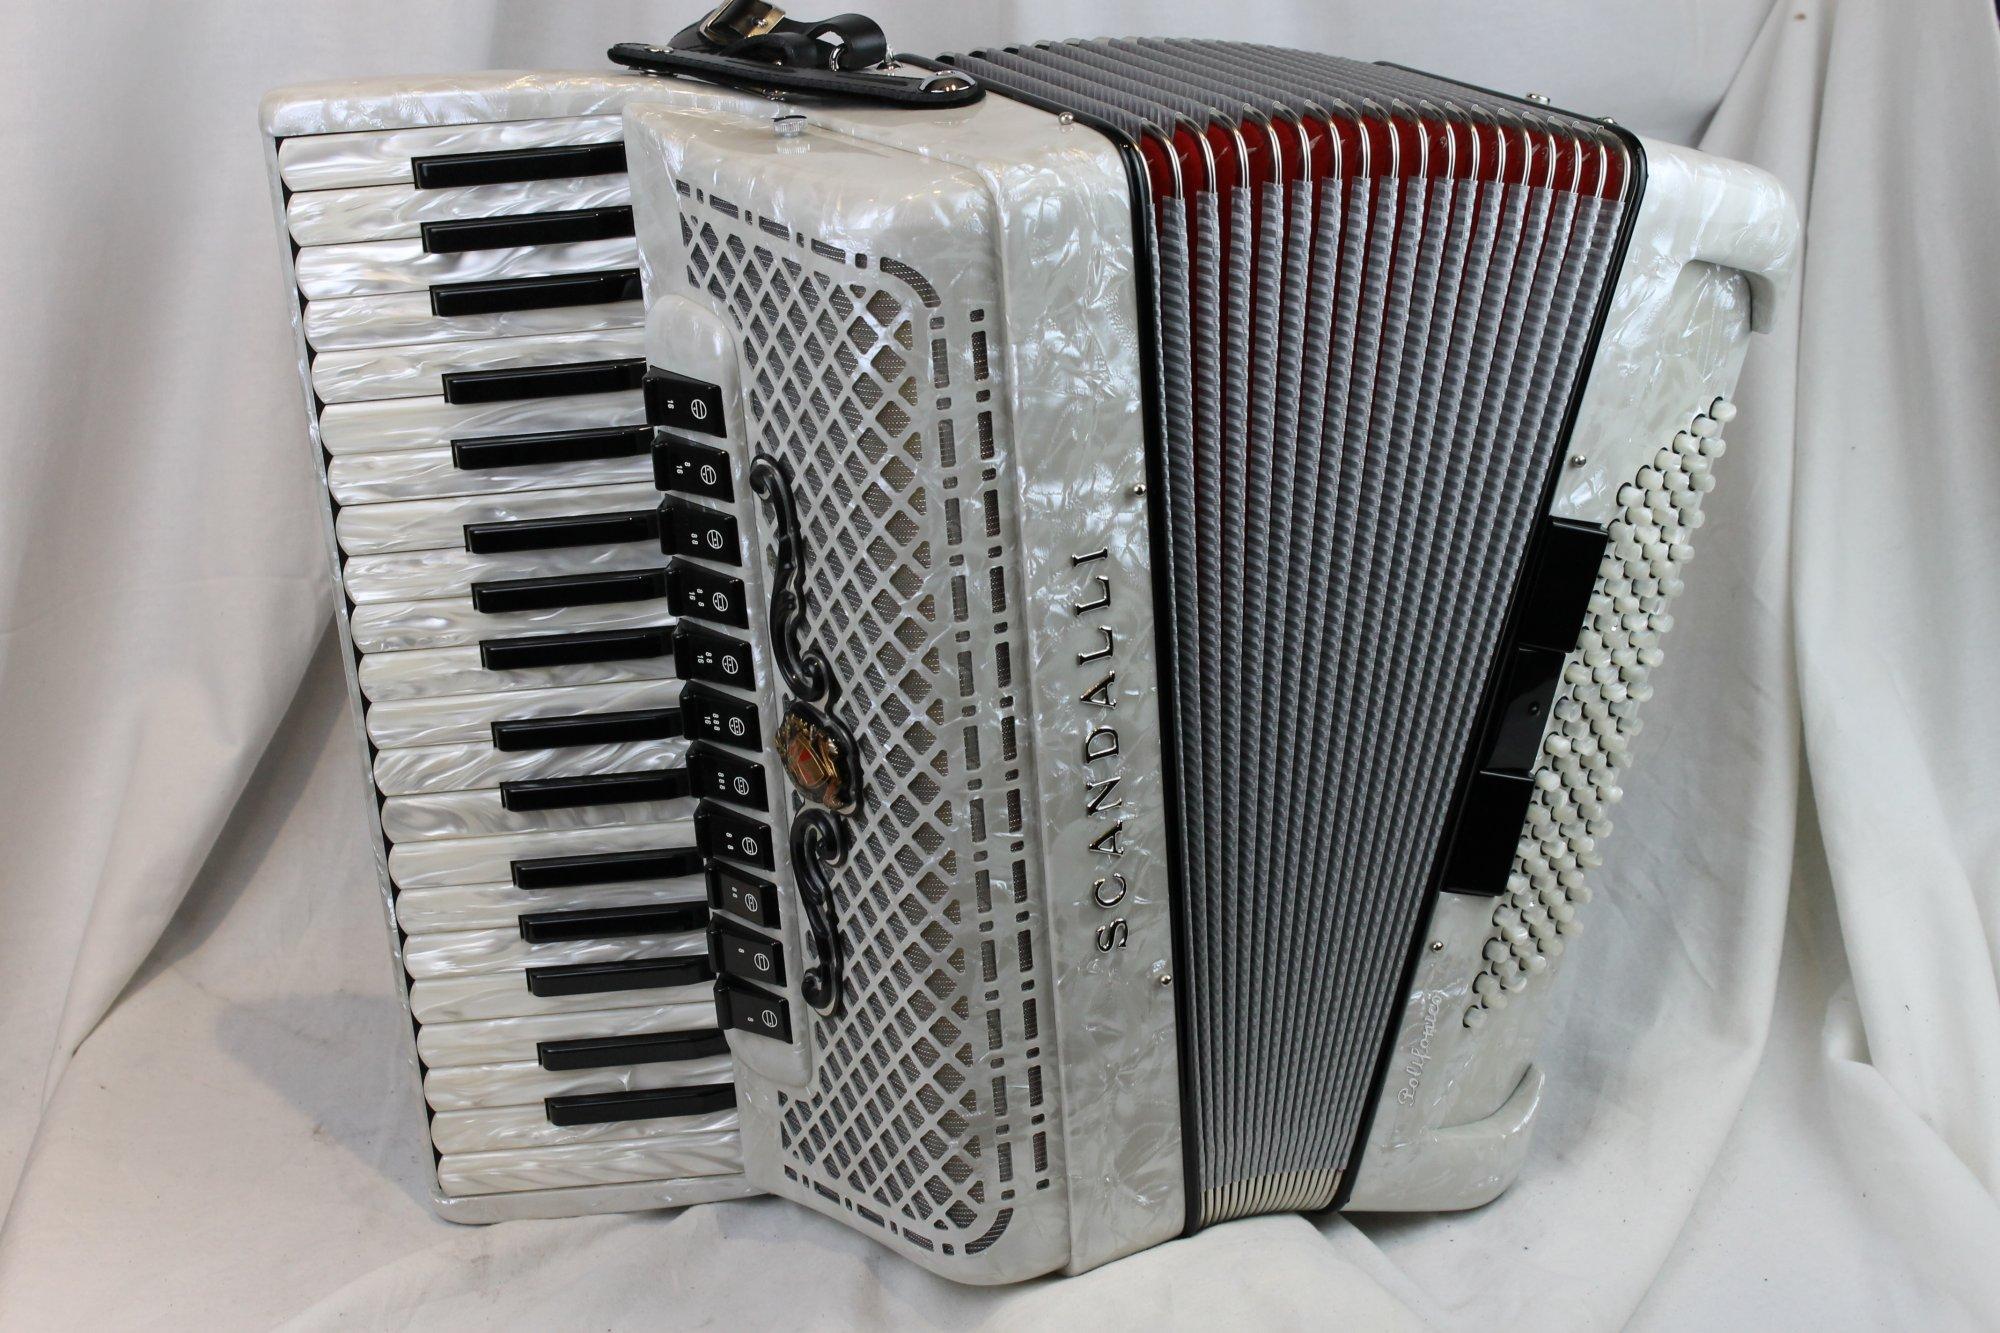 NEW White Scandalli Polifonico IX Piano Accordion LMMM 37 96